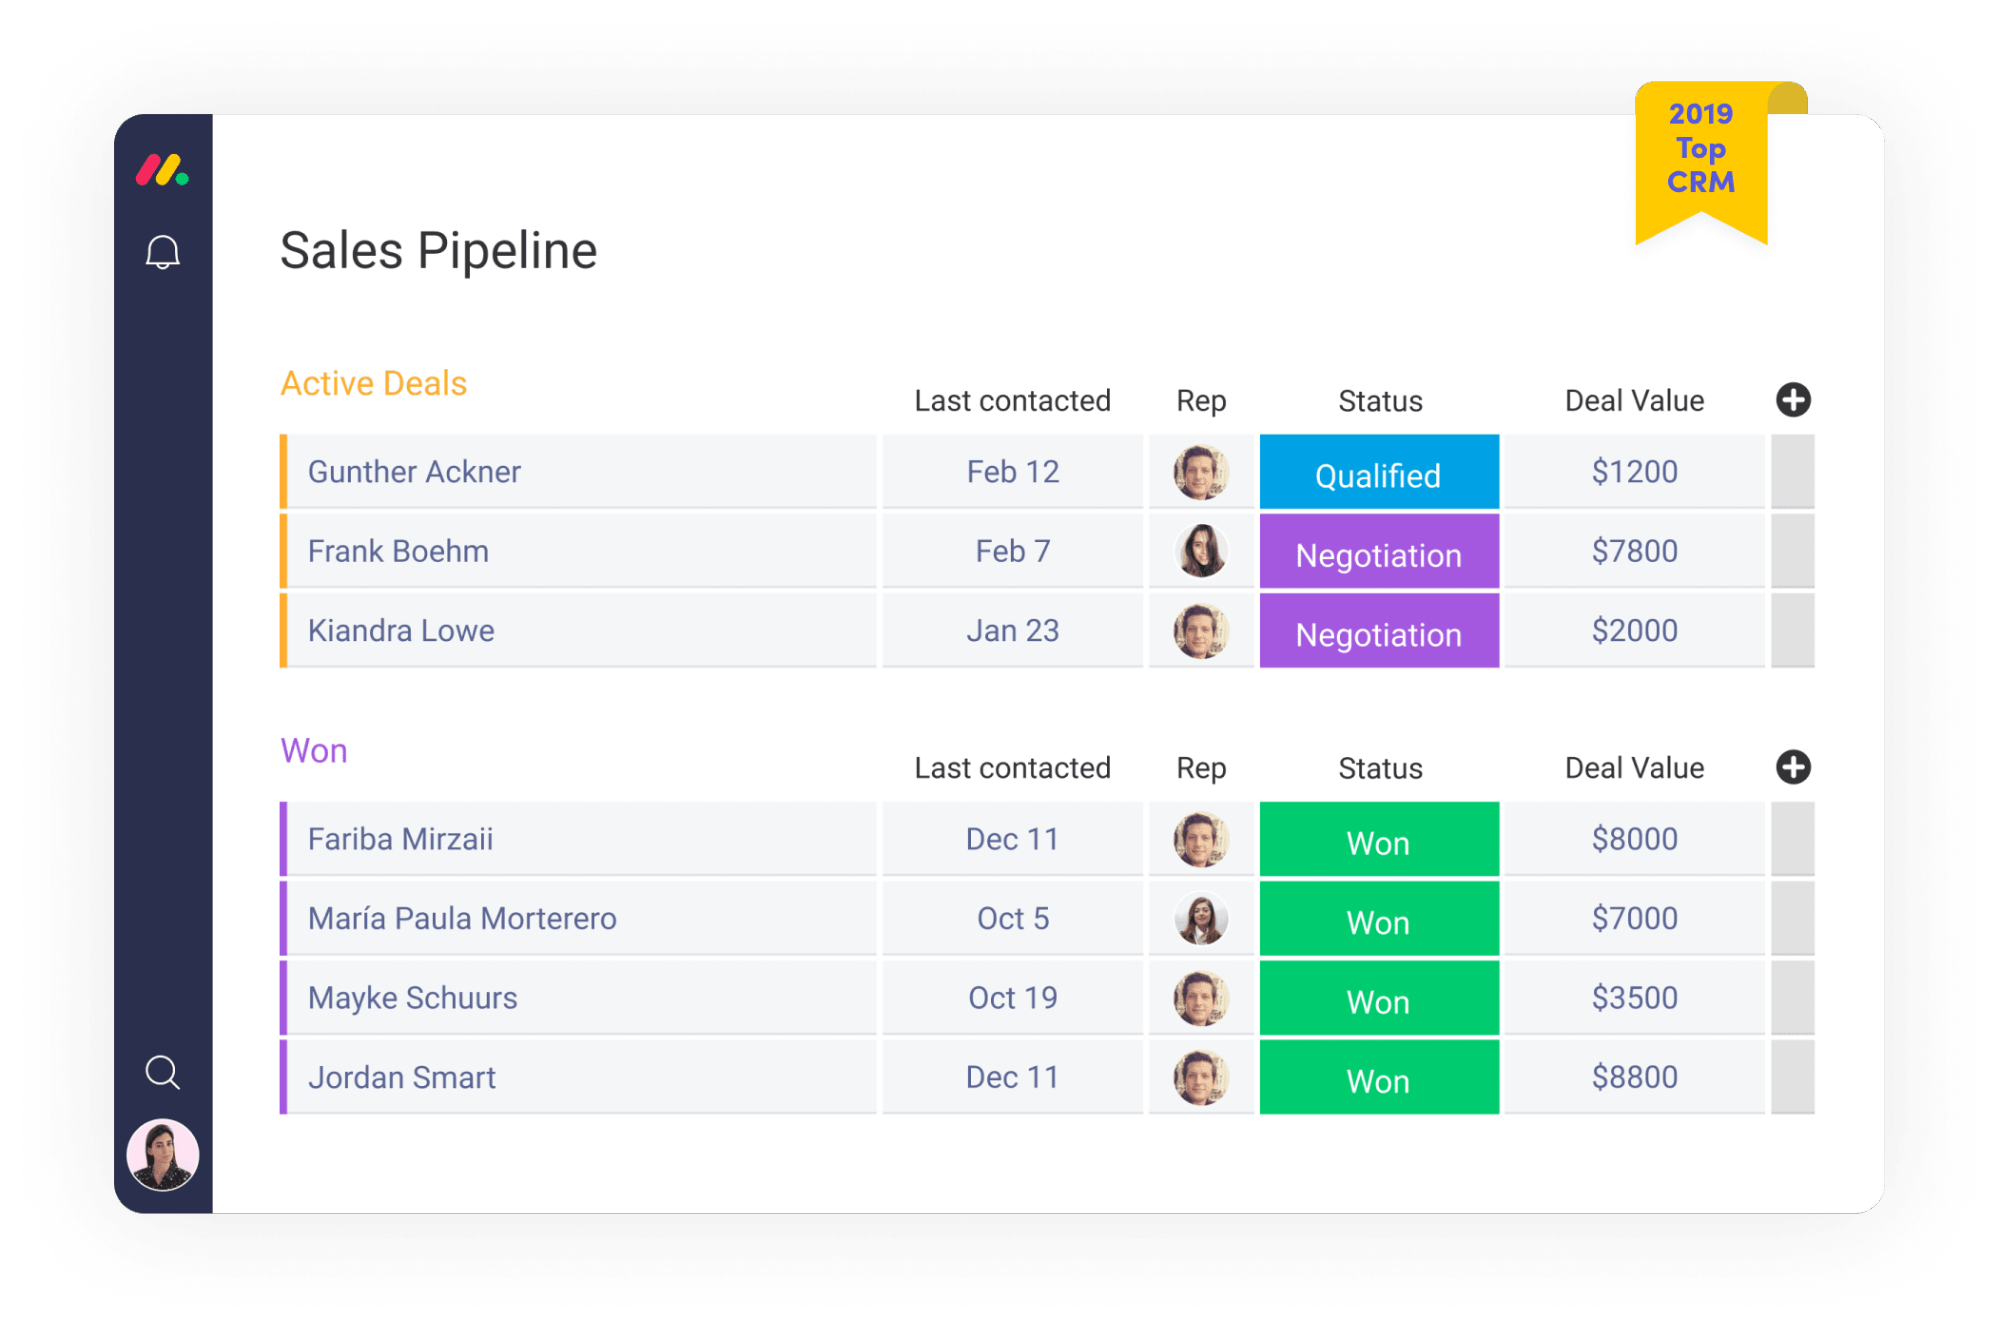 Photo of monday.com's sales pipeline template